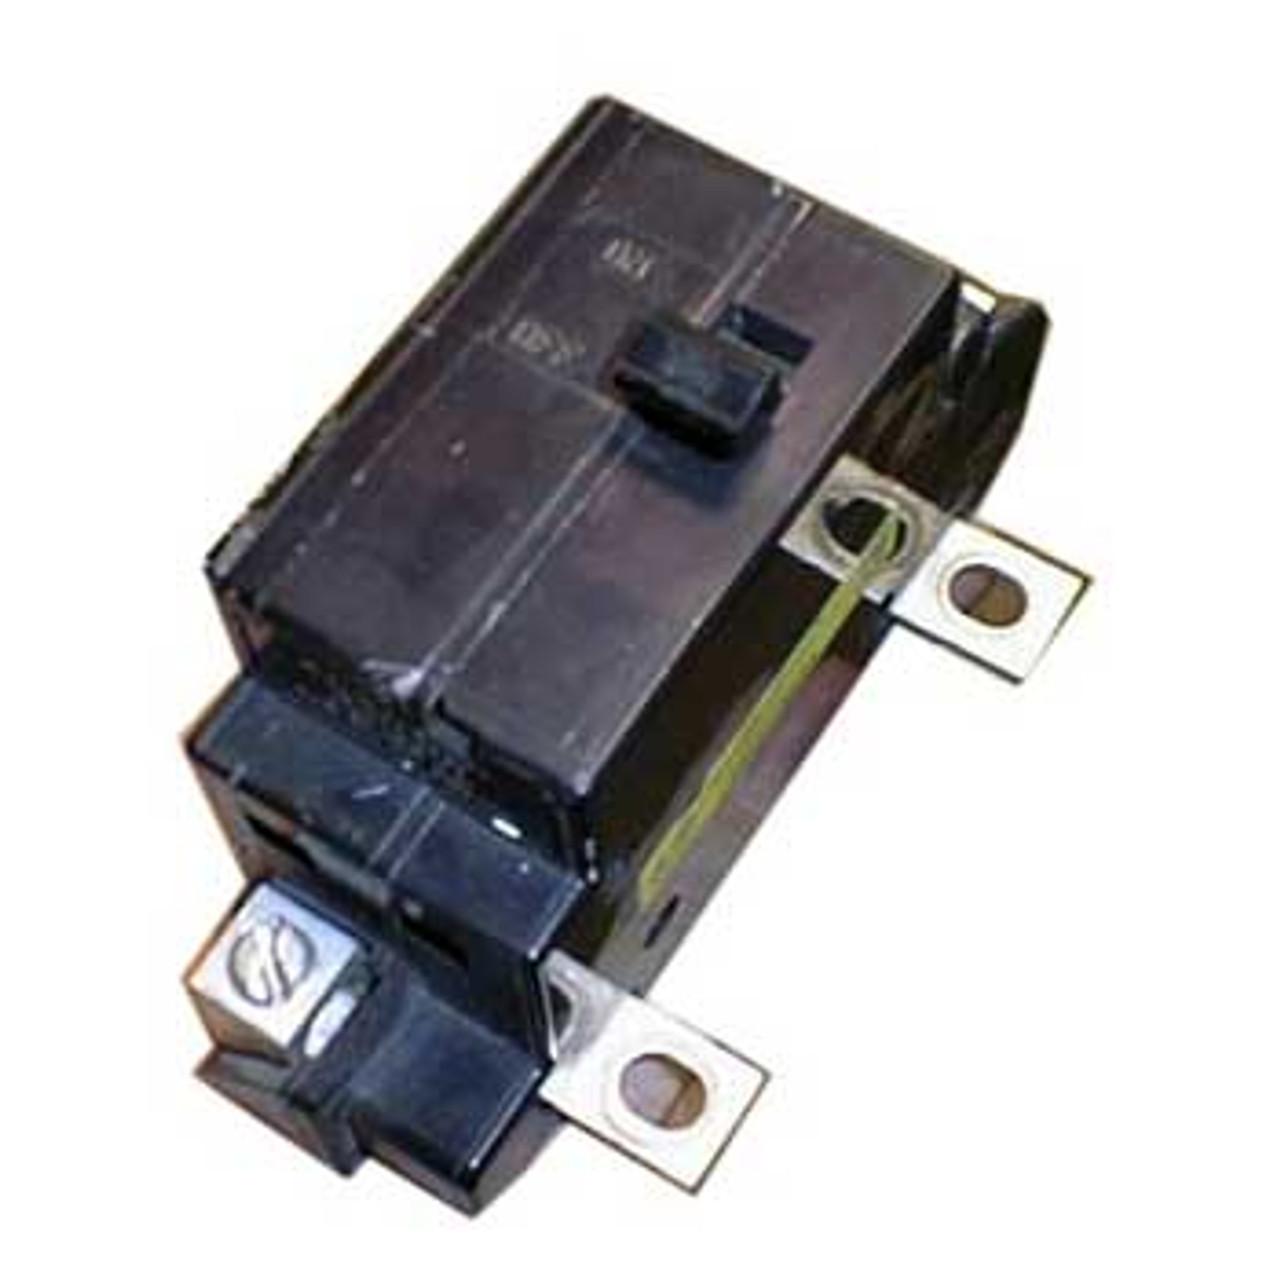 Square D QOM2100BV 2 Pole, 100 Amp, 240 VAC Circuit Breaker - New